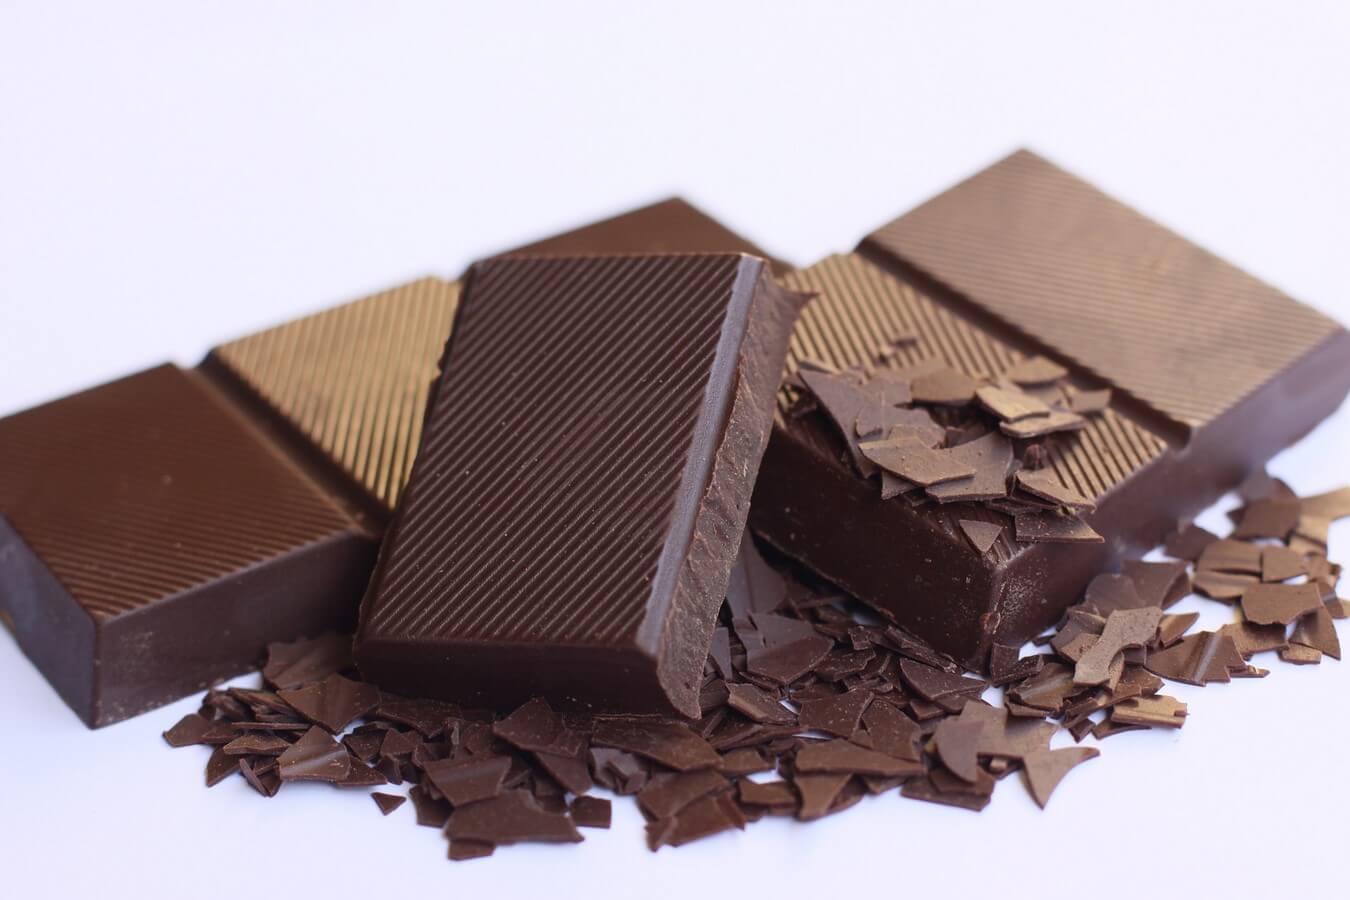 chocolate gift baskets israel